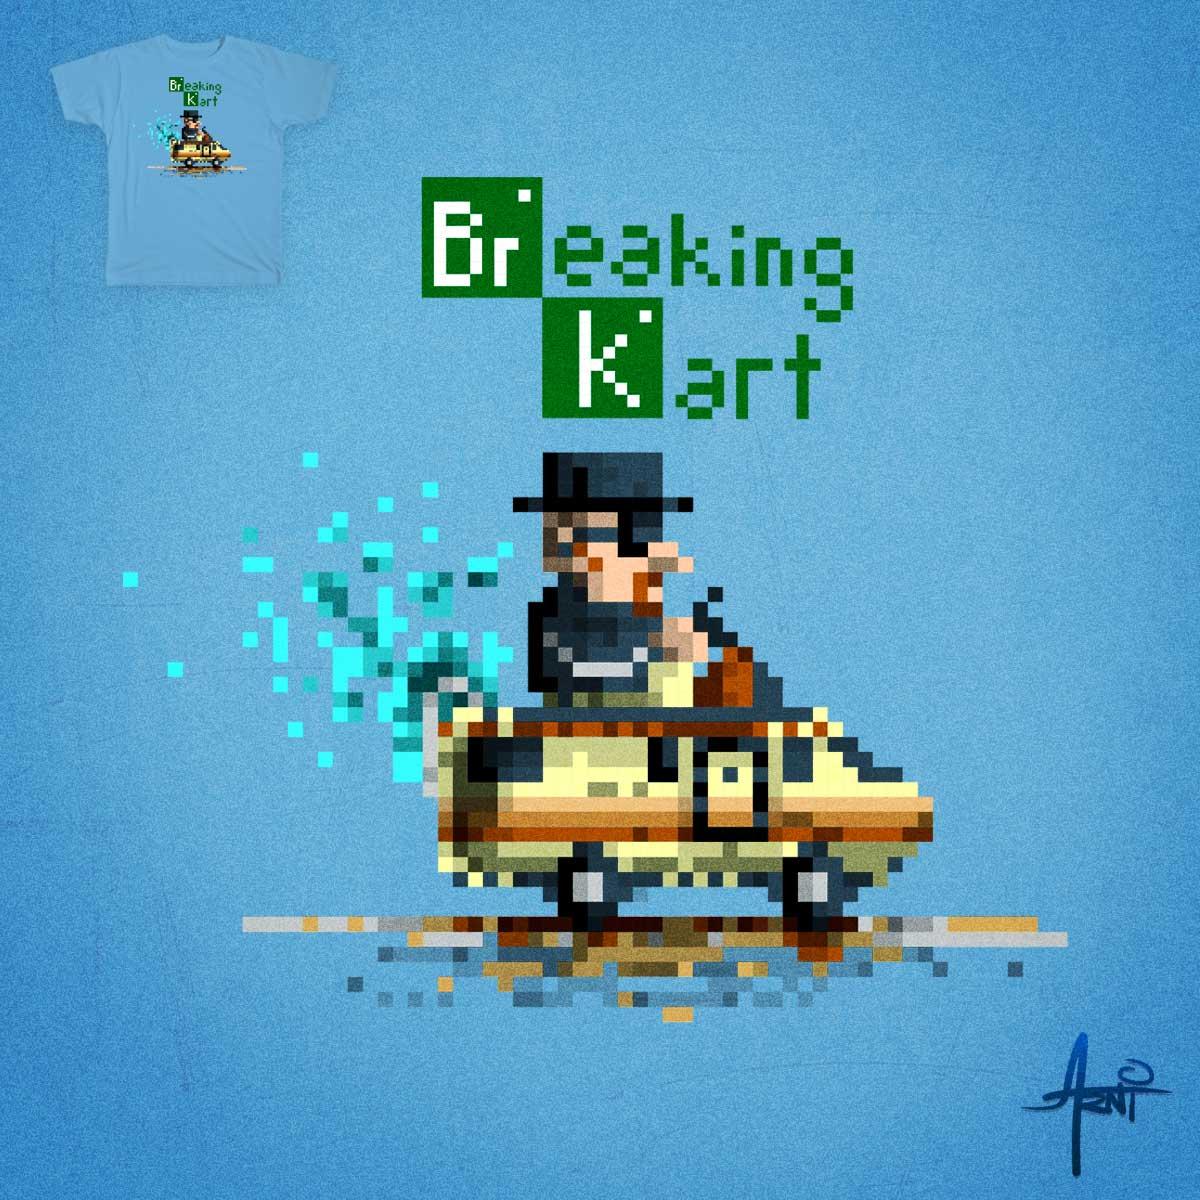 Breaking Kart by albertoarni on Threadless